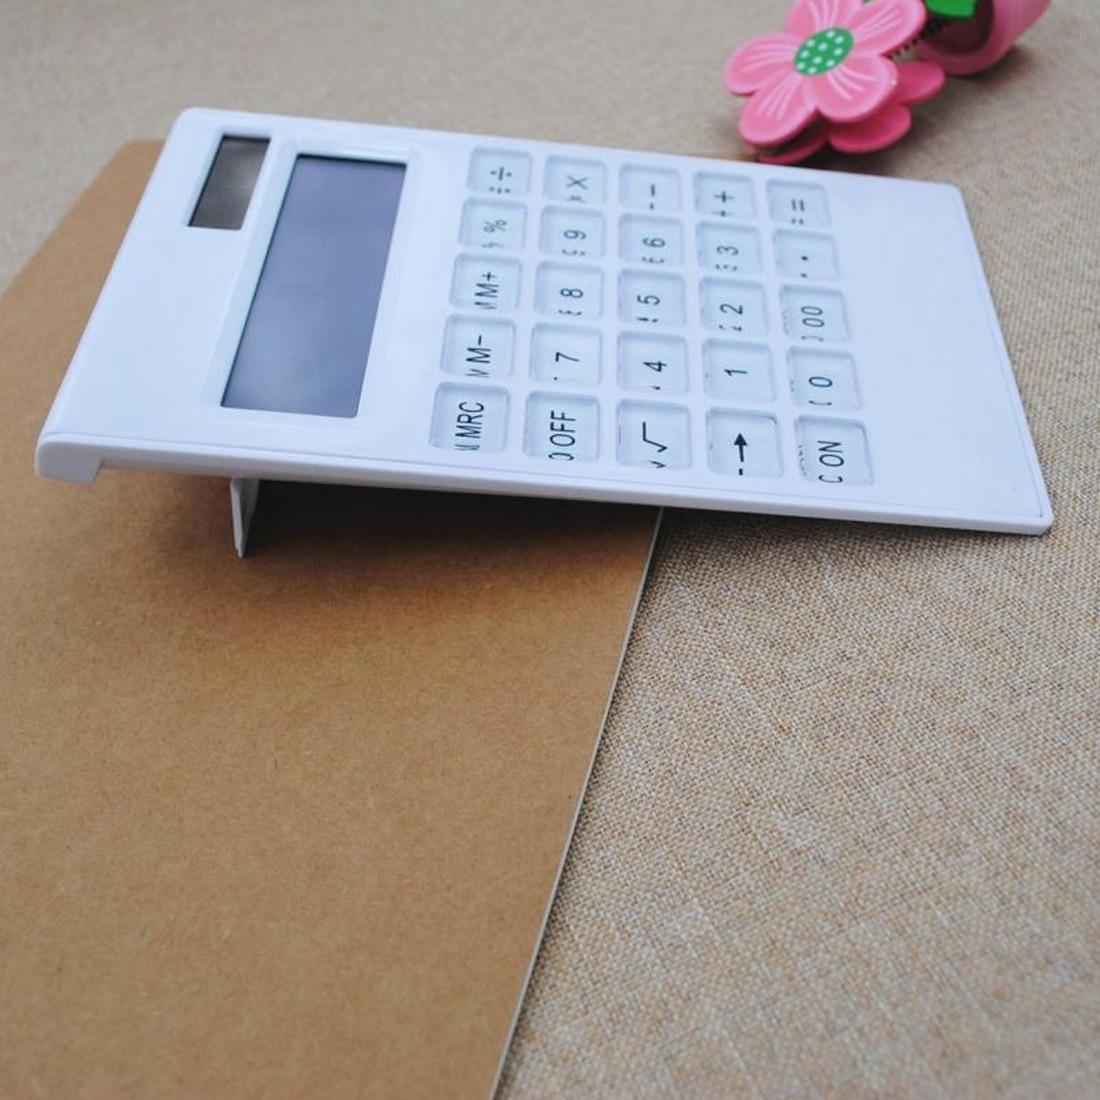 NOYOKERE Venta caliente creativo delgado portátil mini 12 calculadora digital energía Solar cristal teclado doble fuente de alimentación